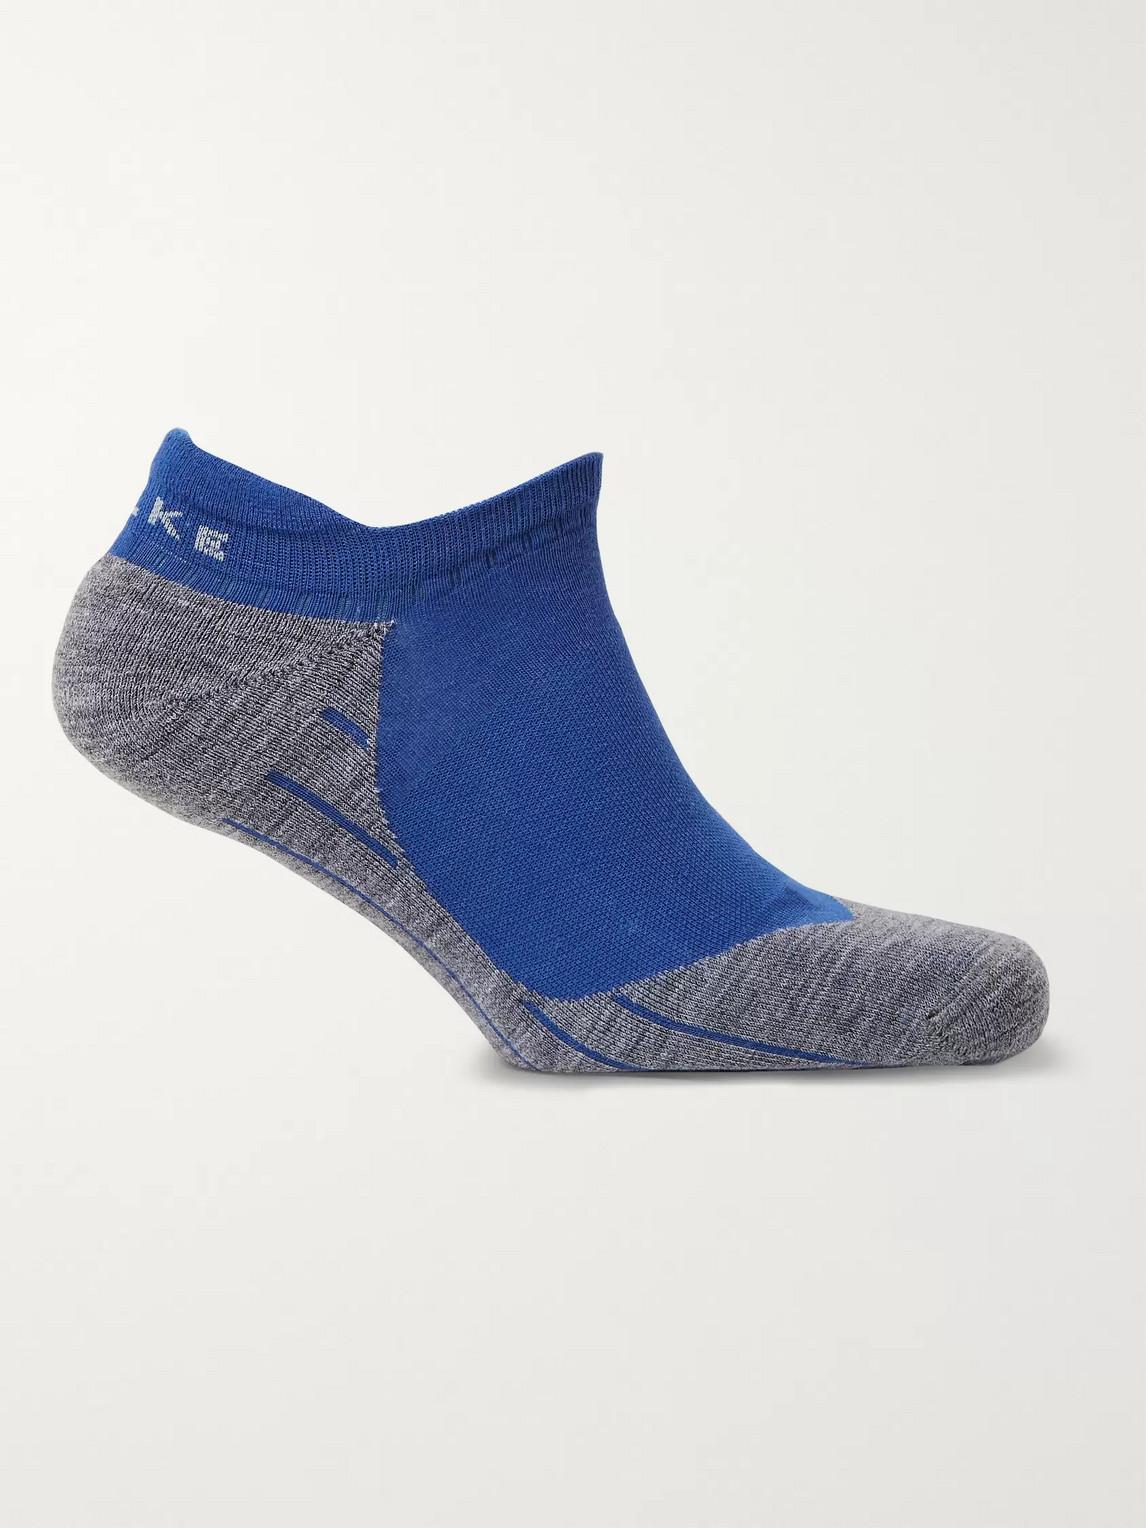 falke ergonomic sport system - ru4 no-show socks - men - blue